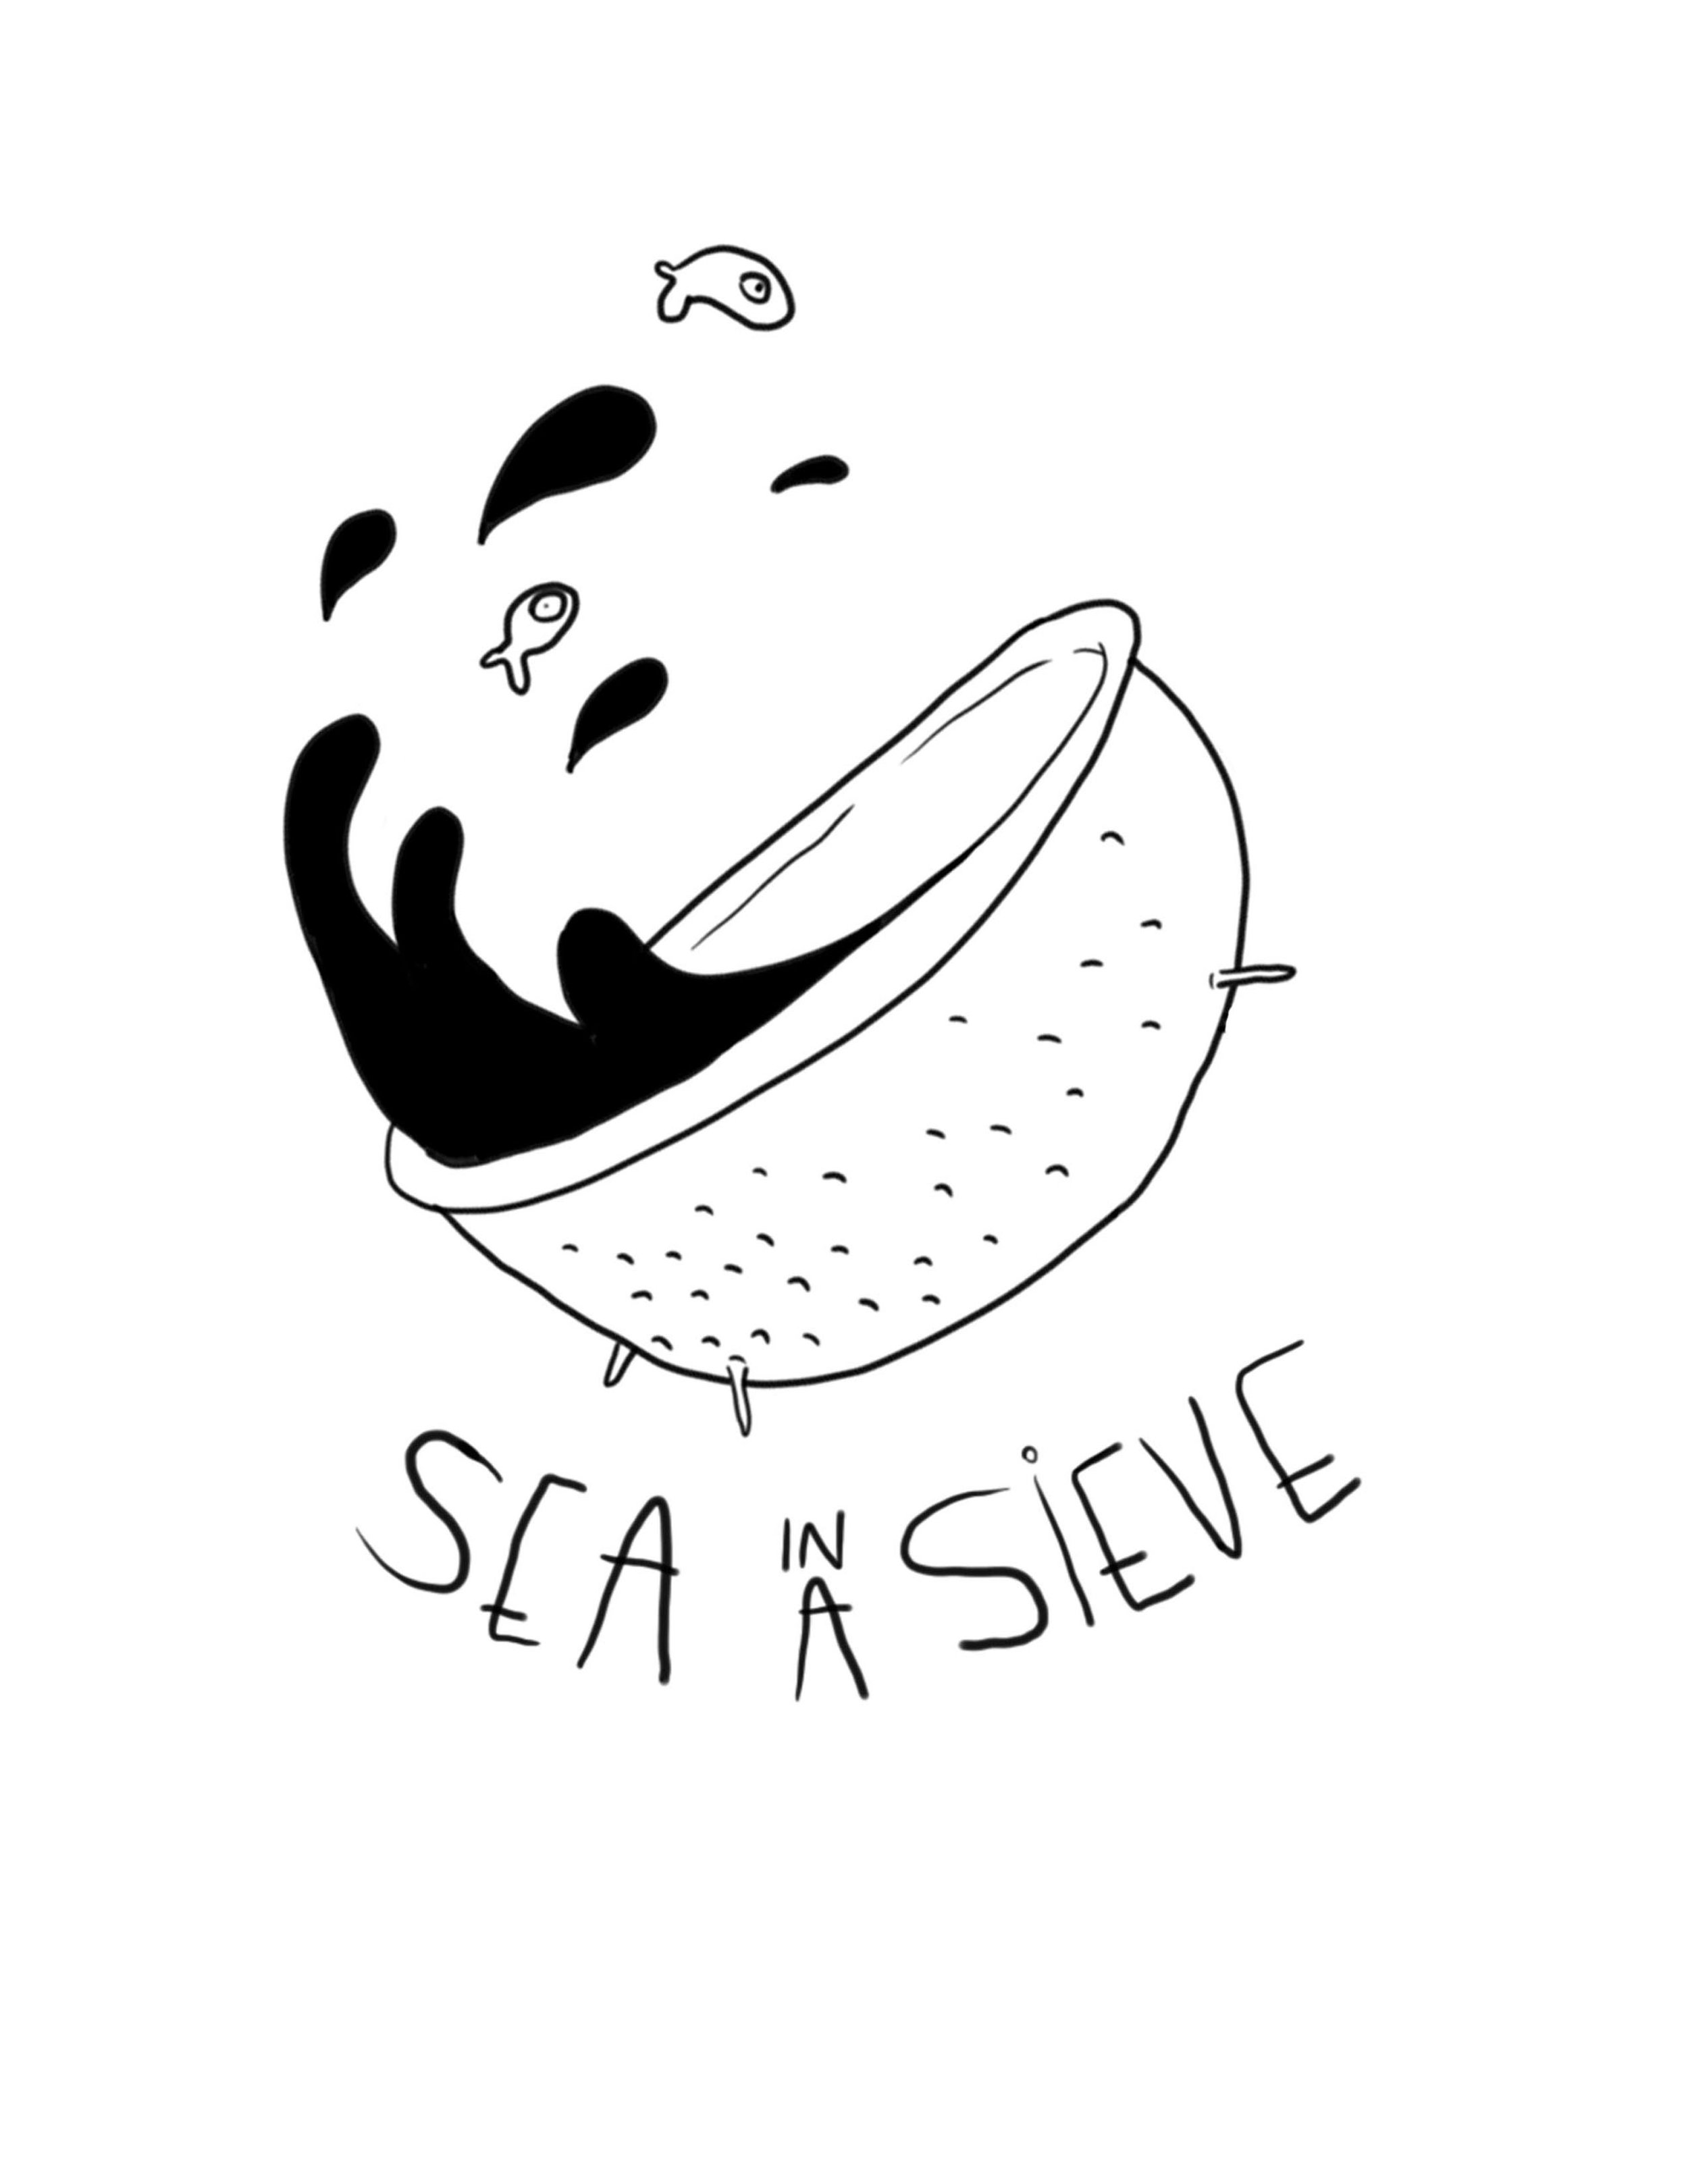 Sea in a Sieve, Theatre Company - Manchester, UK, 2017